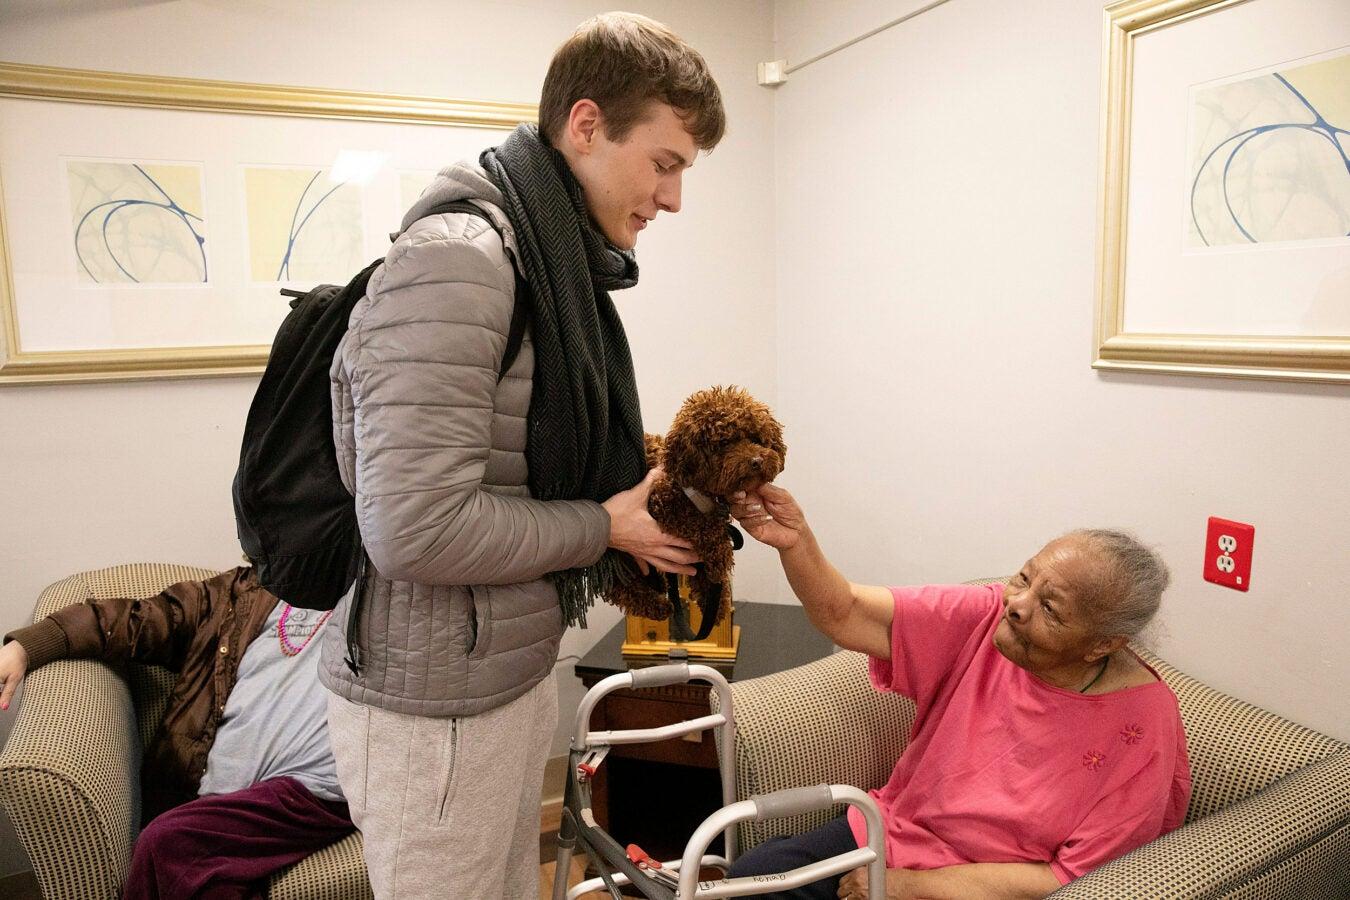 Student holds dog while elderly woman pat dog.